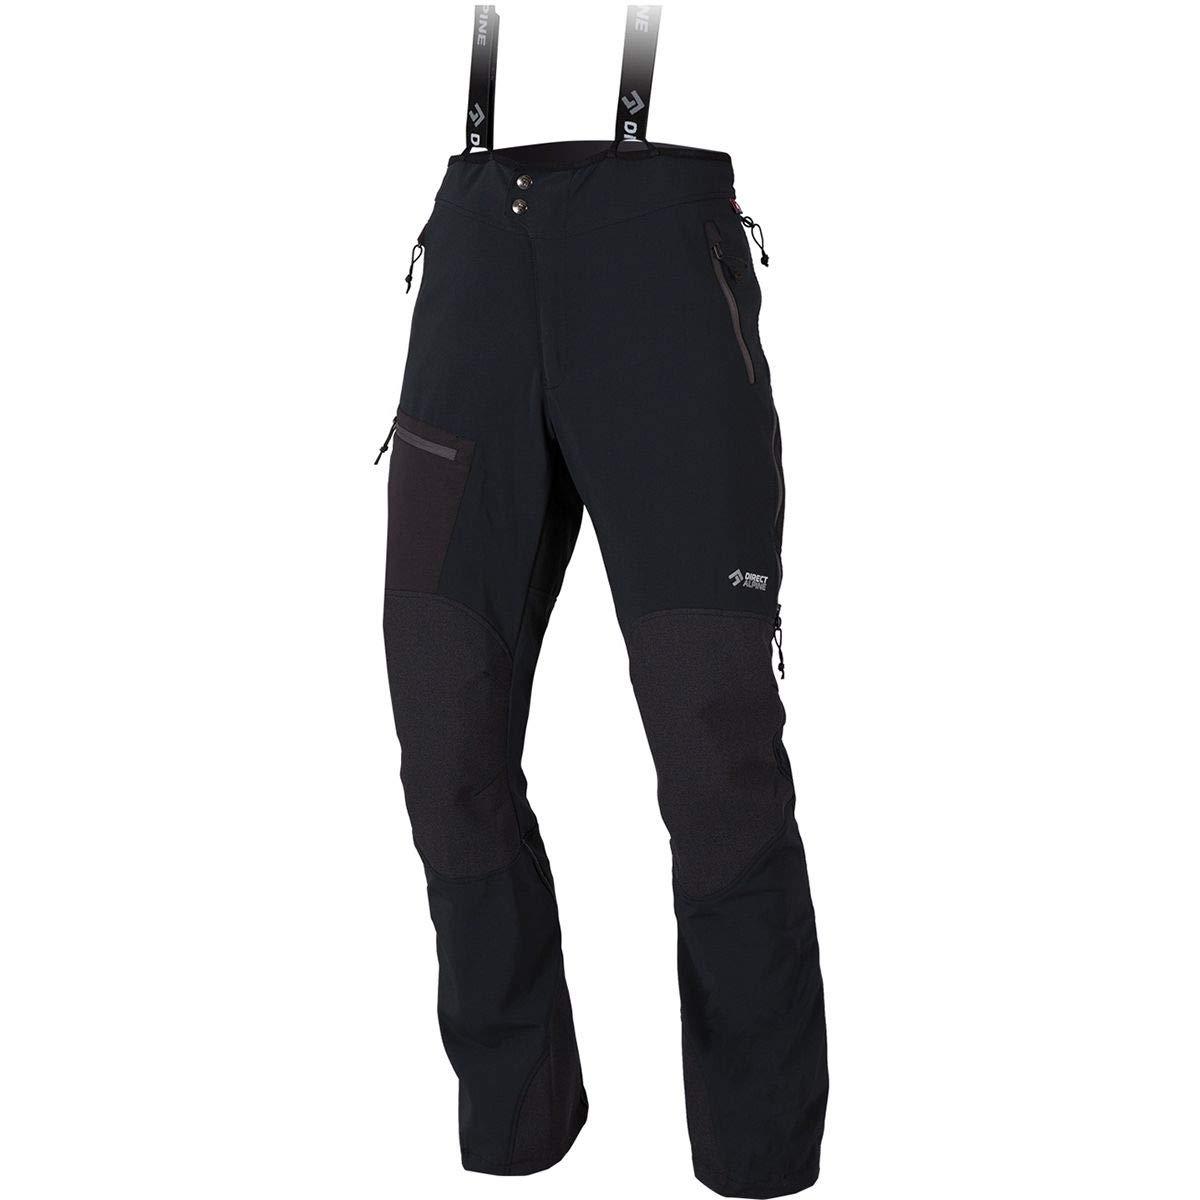 Directalpine Couloir Plus 1.0 Pants Men schwarz 2018 Hose lang